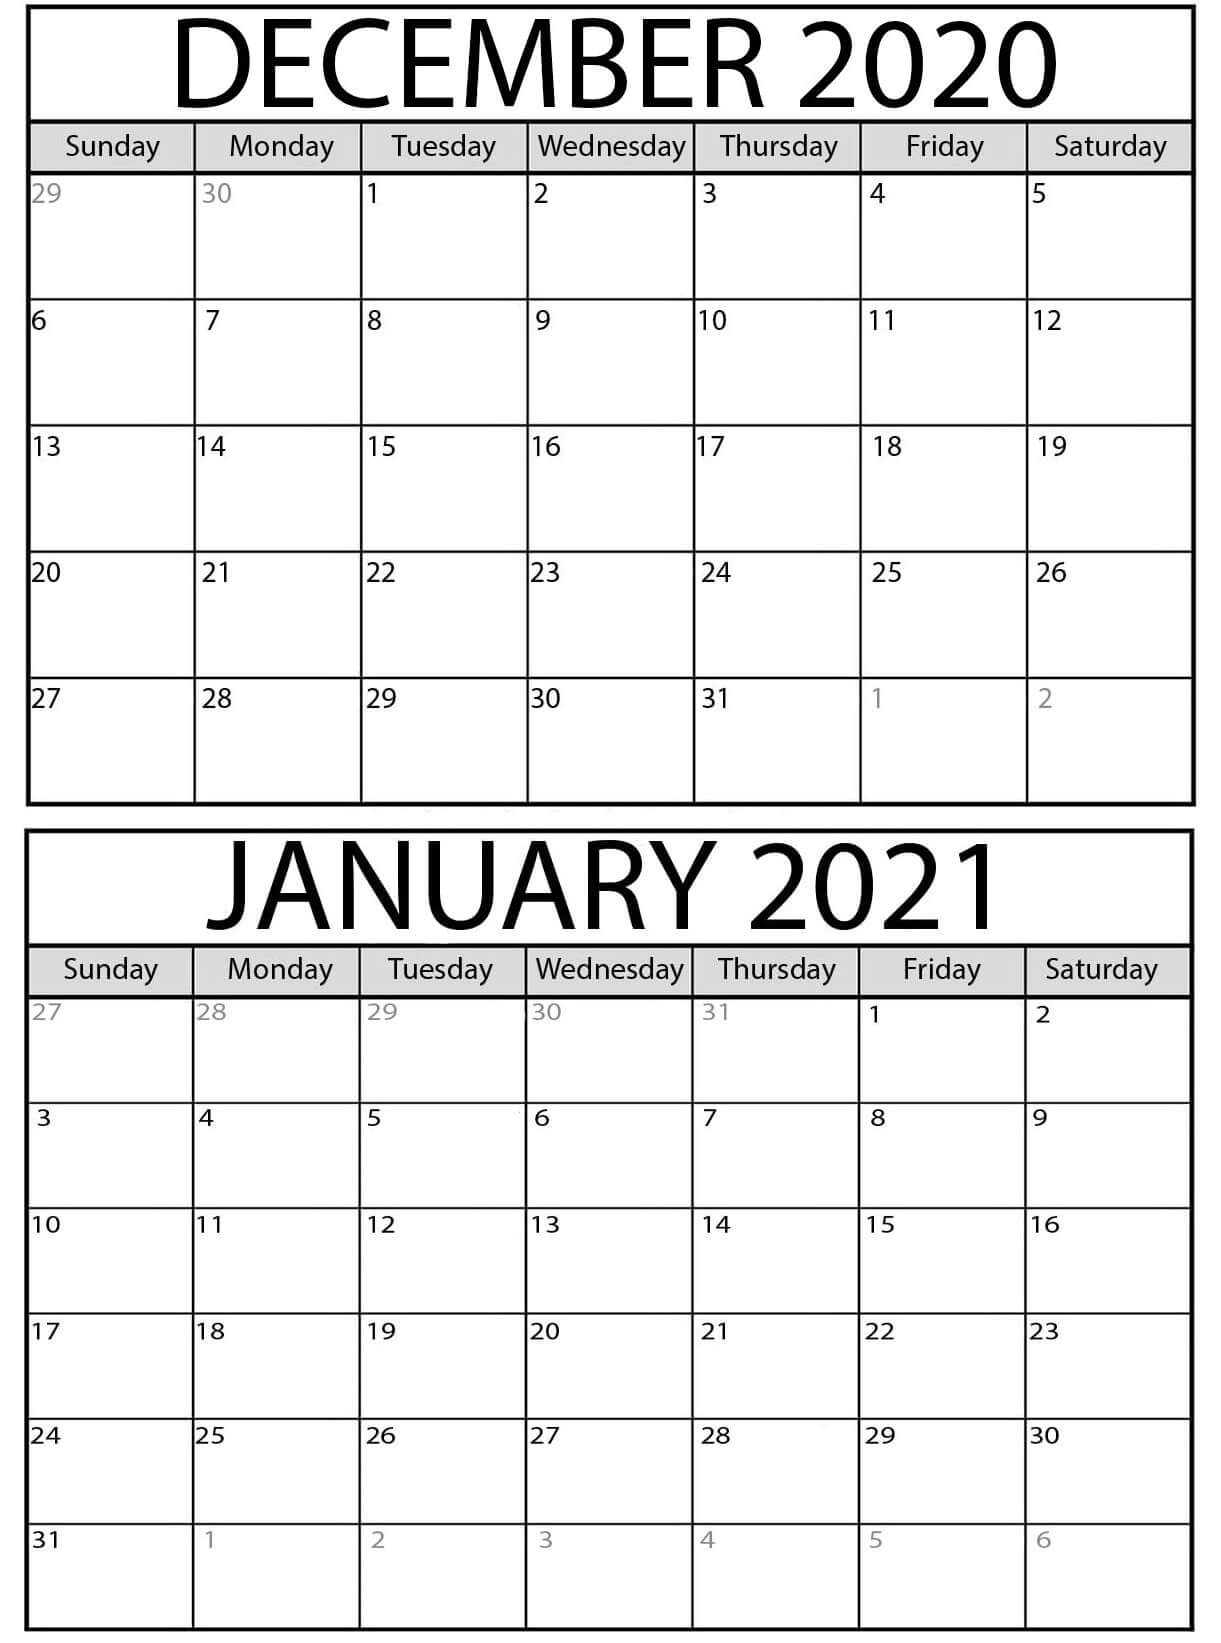 Free Printable Calendar December 2020 January 2021 - Printablecalendarr Calendar December 2020 January 2021